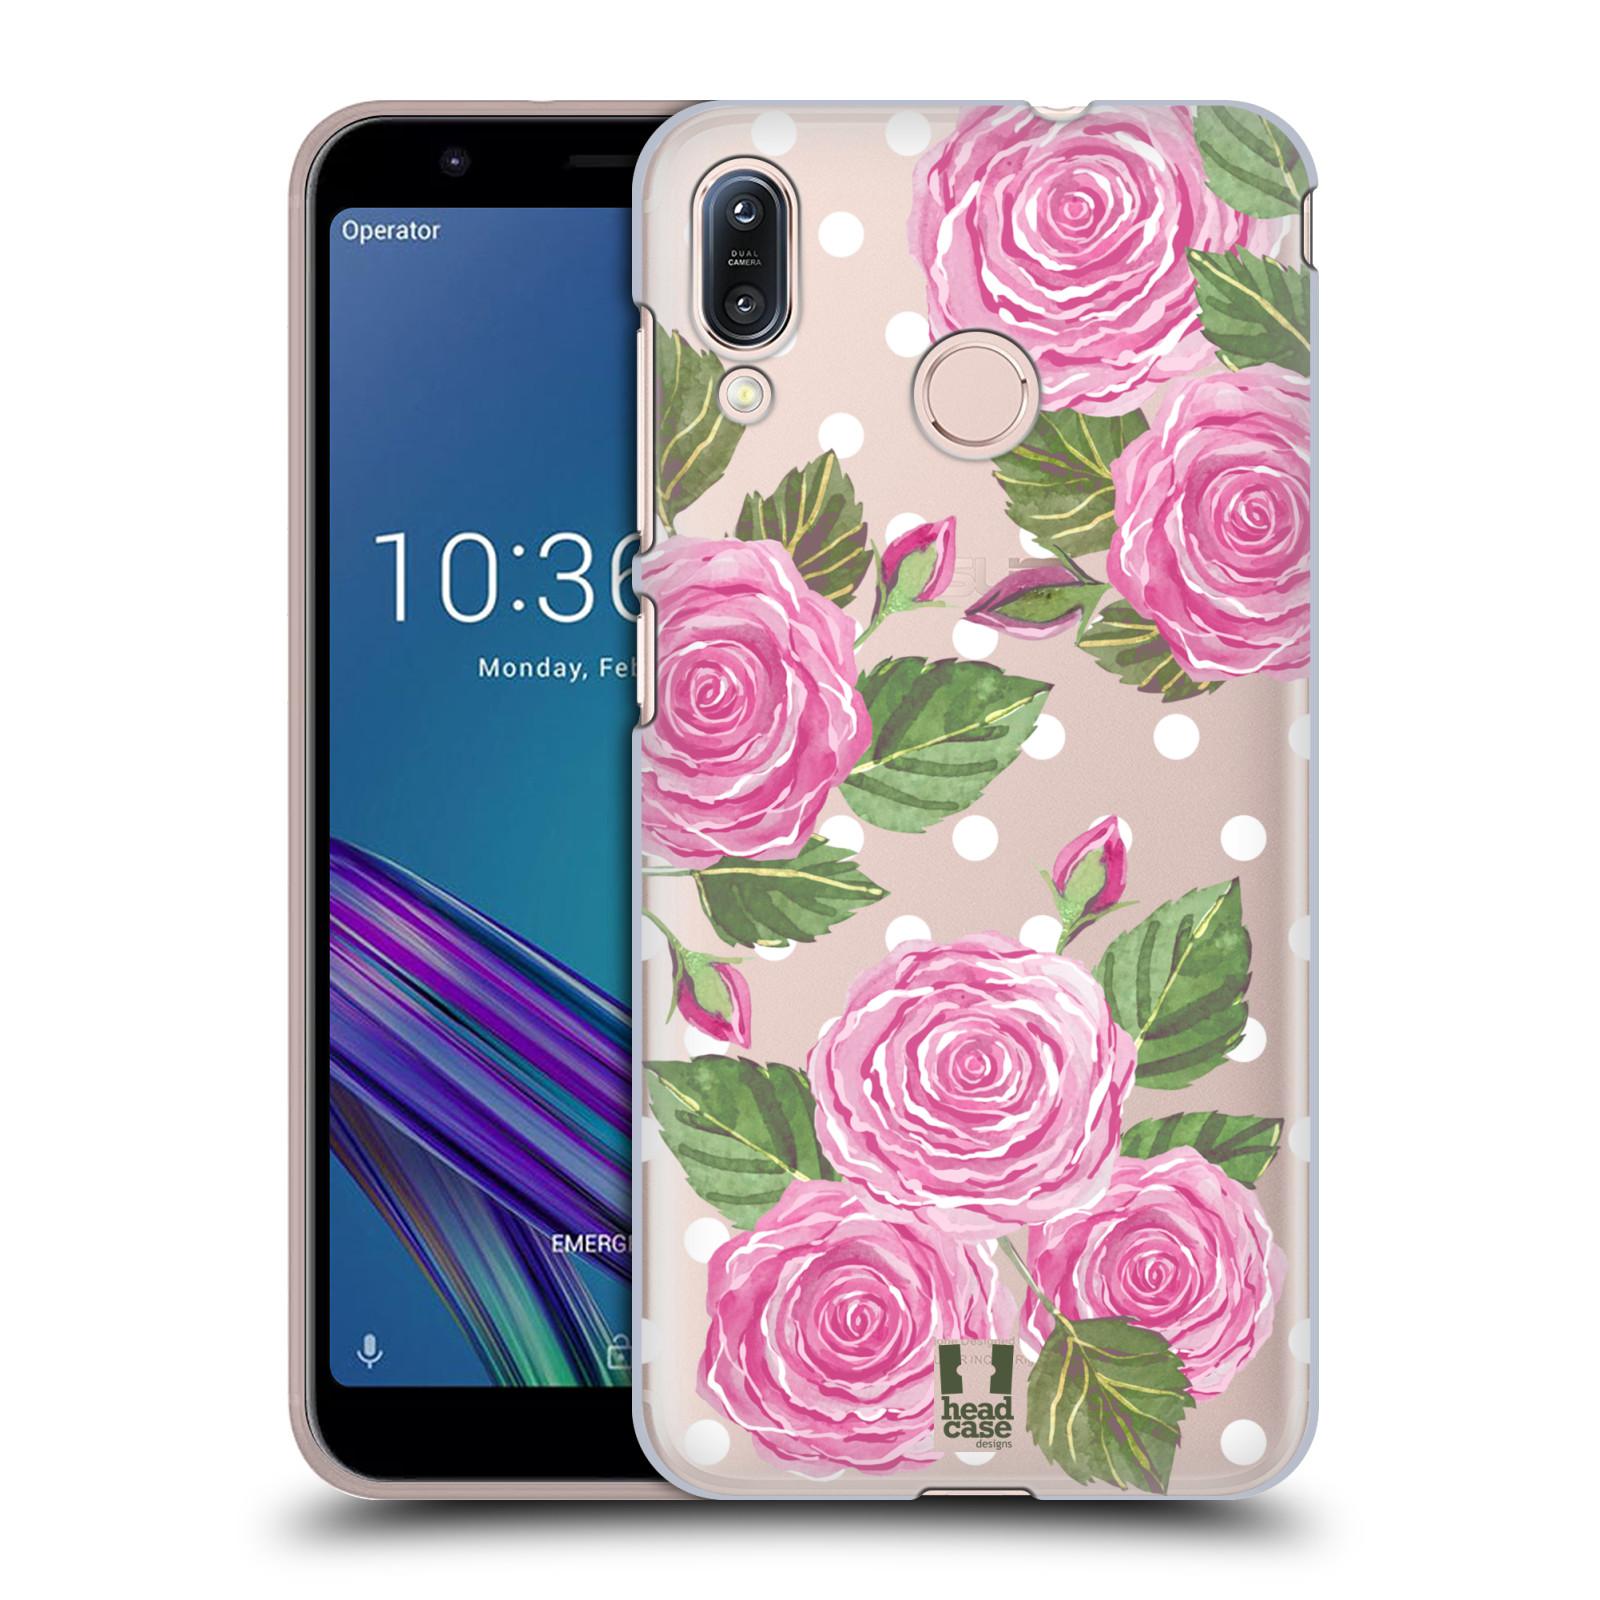 Pouzdro na mobil Asus Zenfone Max M1 (ZB555KL) - HEAD CASE - Anglické růže růžová barva